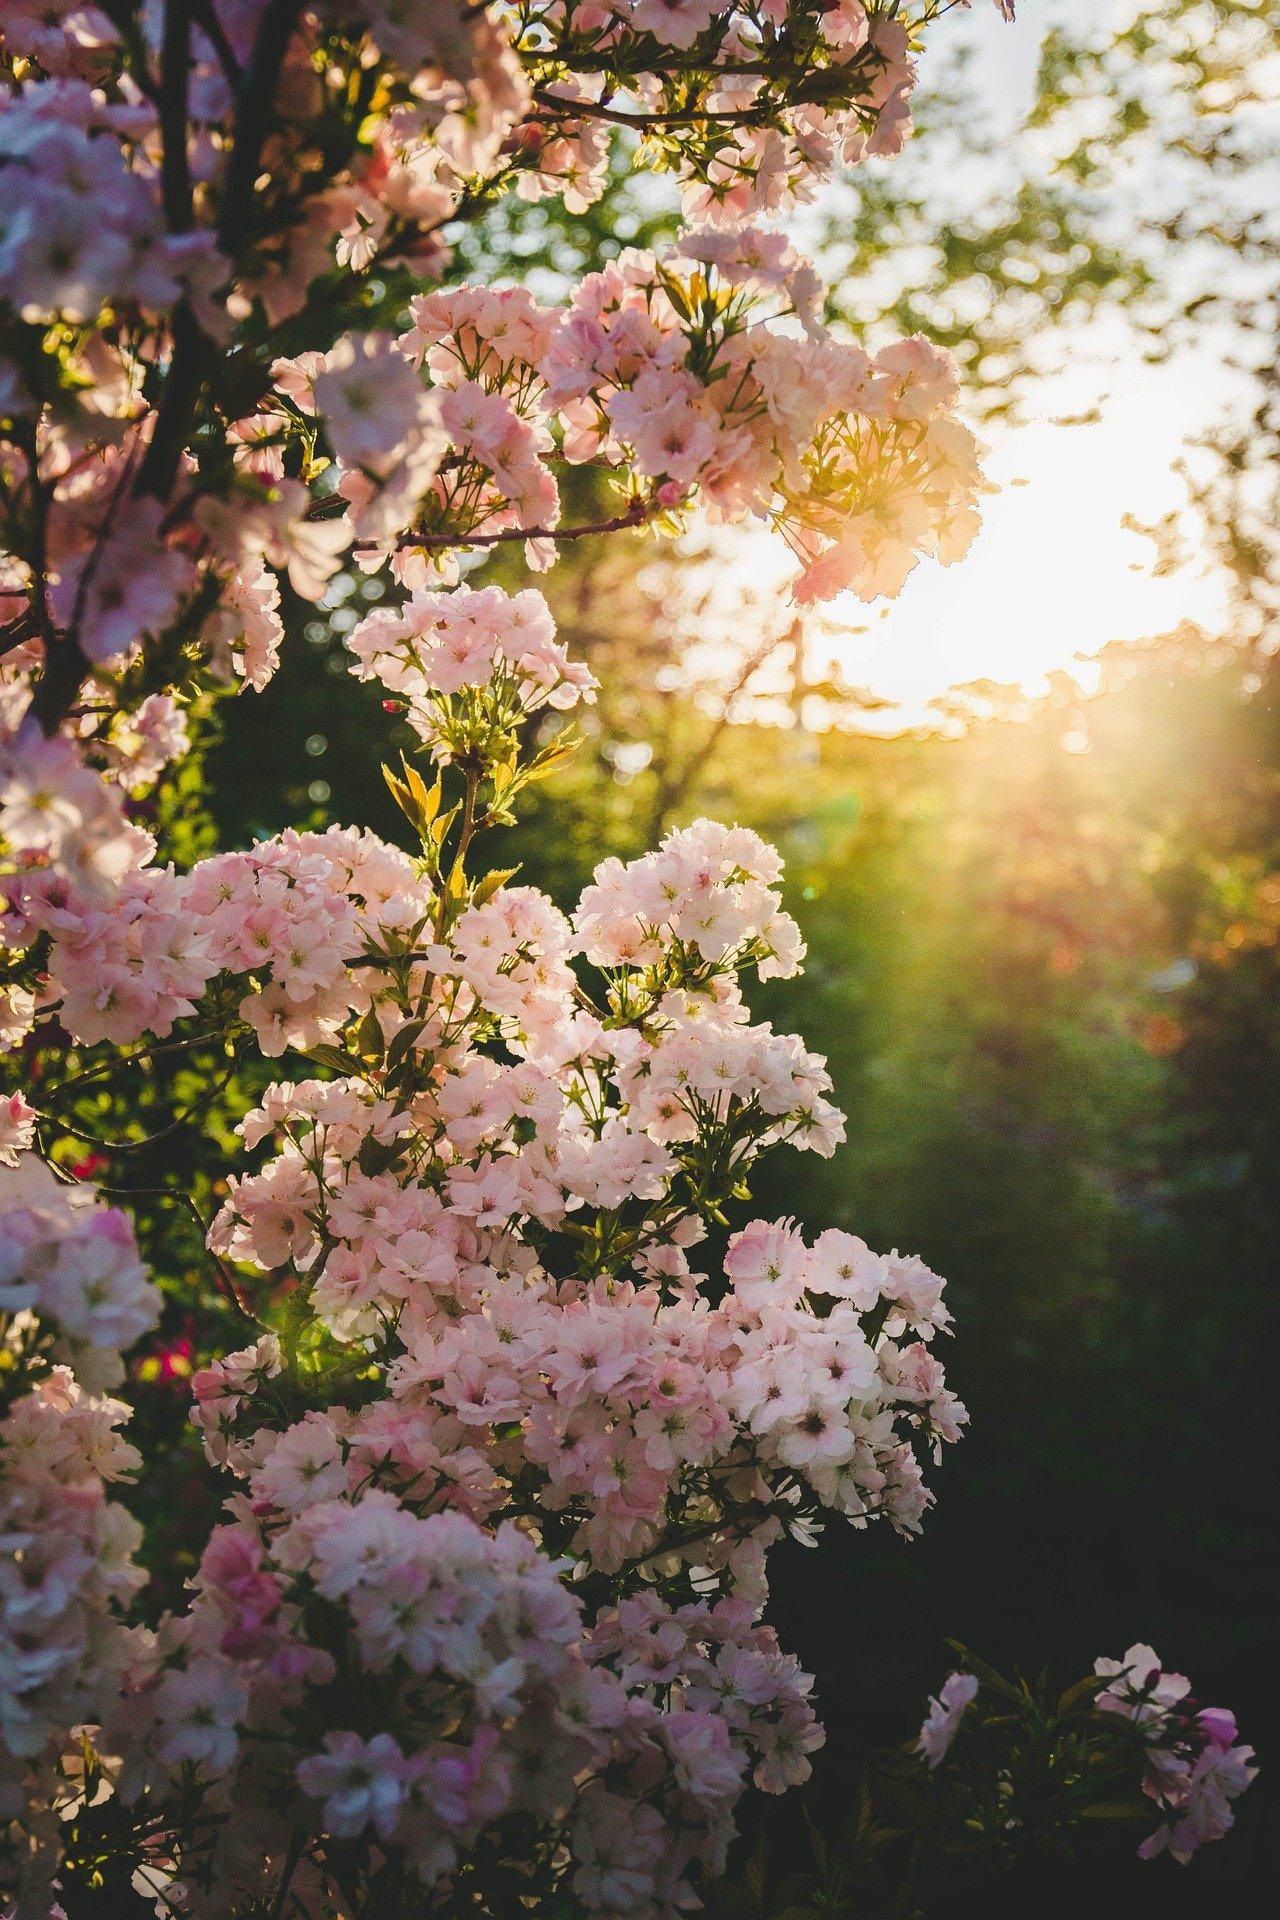 Frühlingsfrischeduft